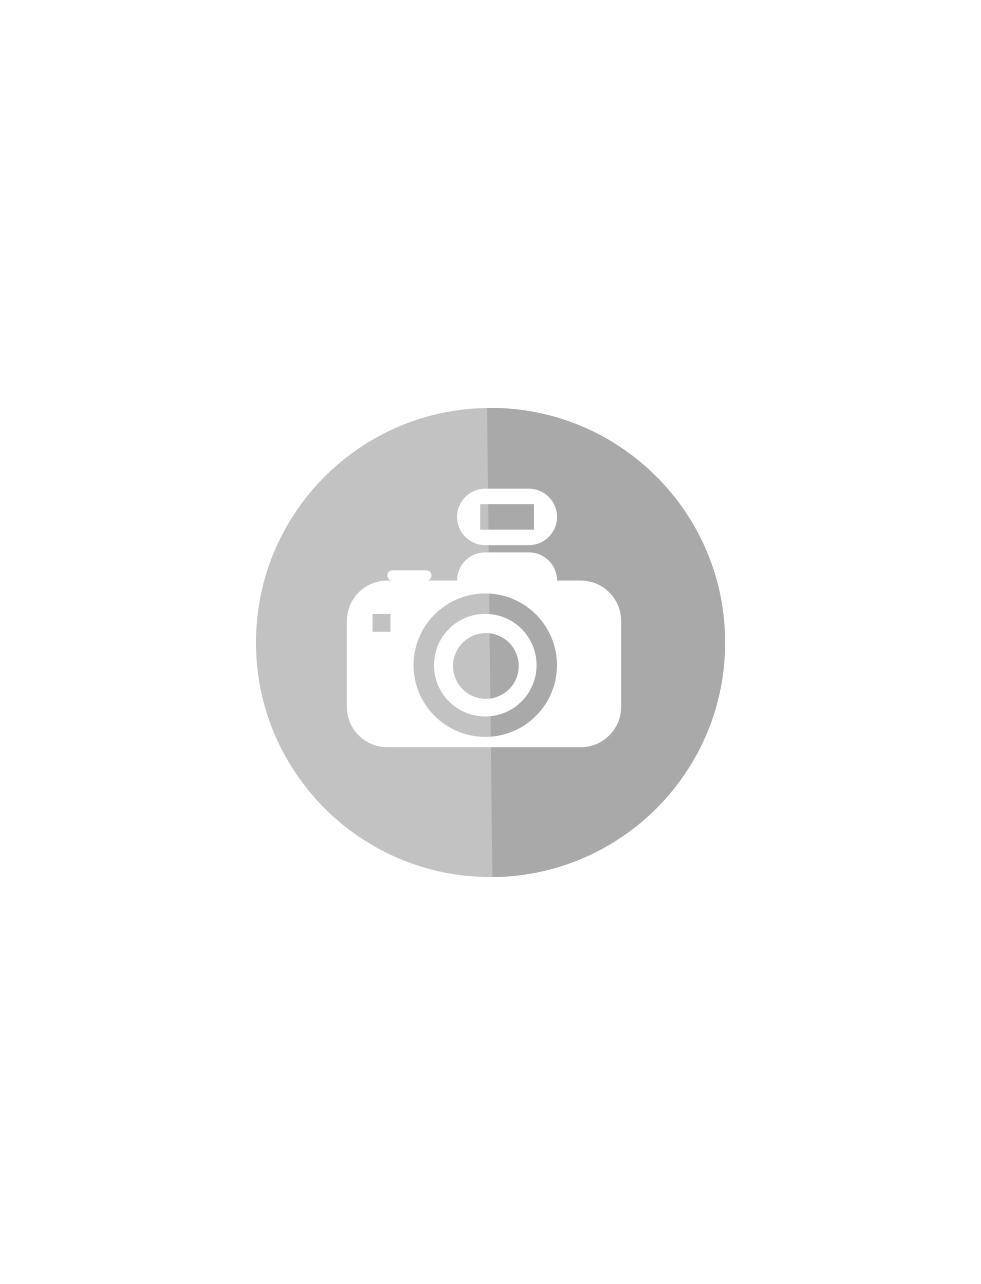 60644520_sparepart/CHEST:APPLES II 14290-14291